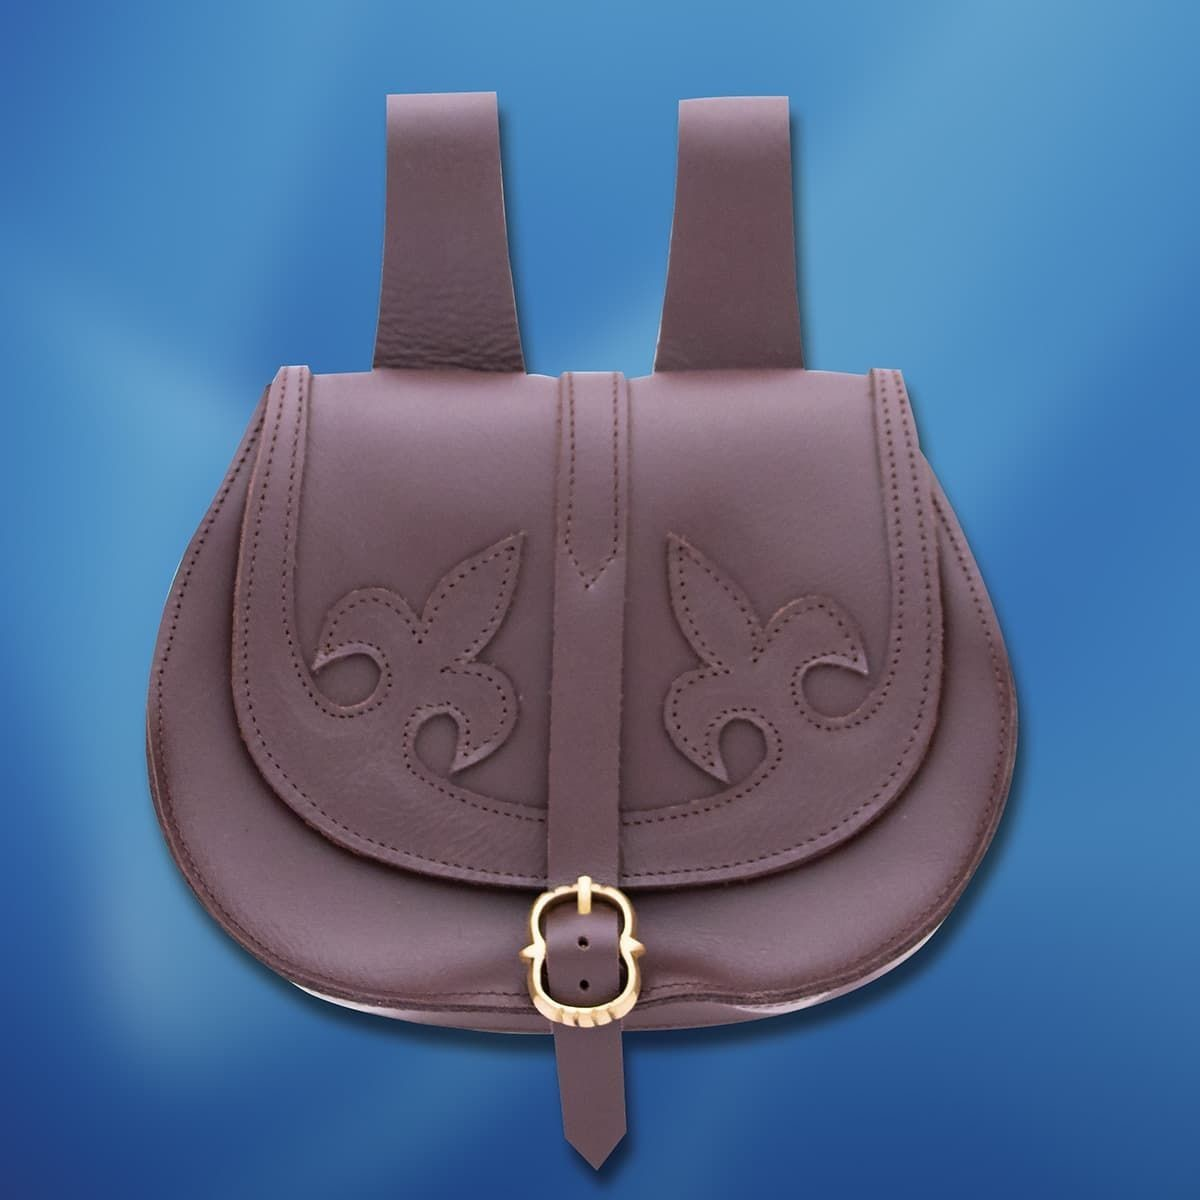 Brown Leather Pouch with Dual Fleur de Lis Pattern